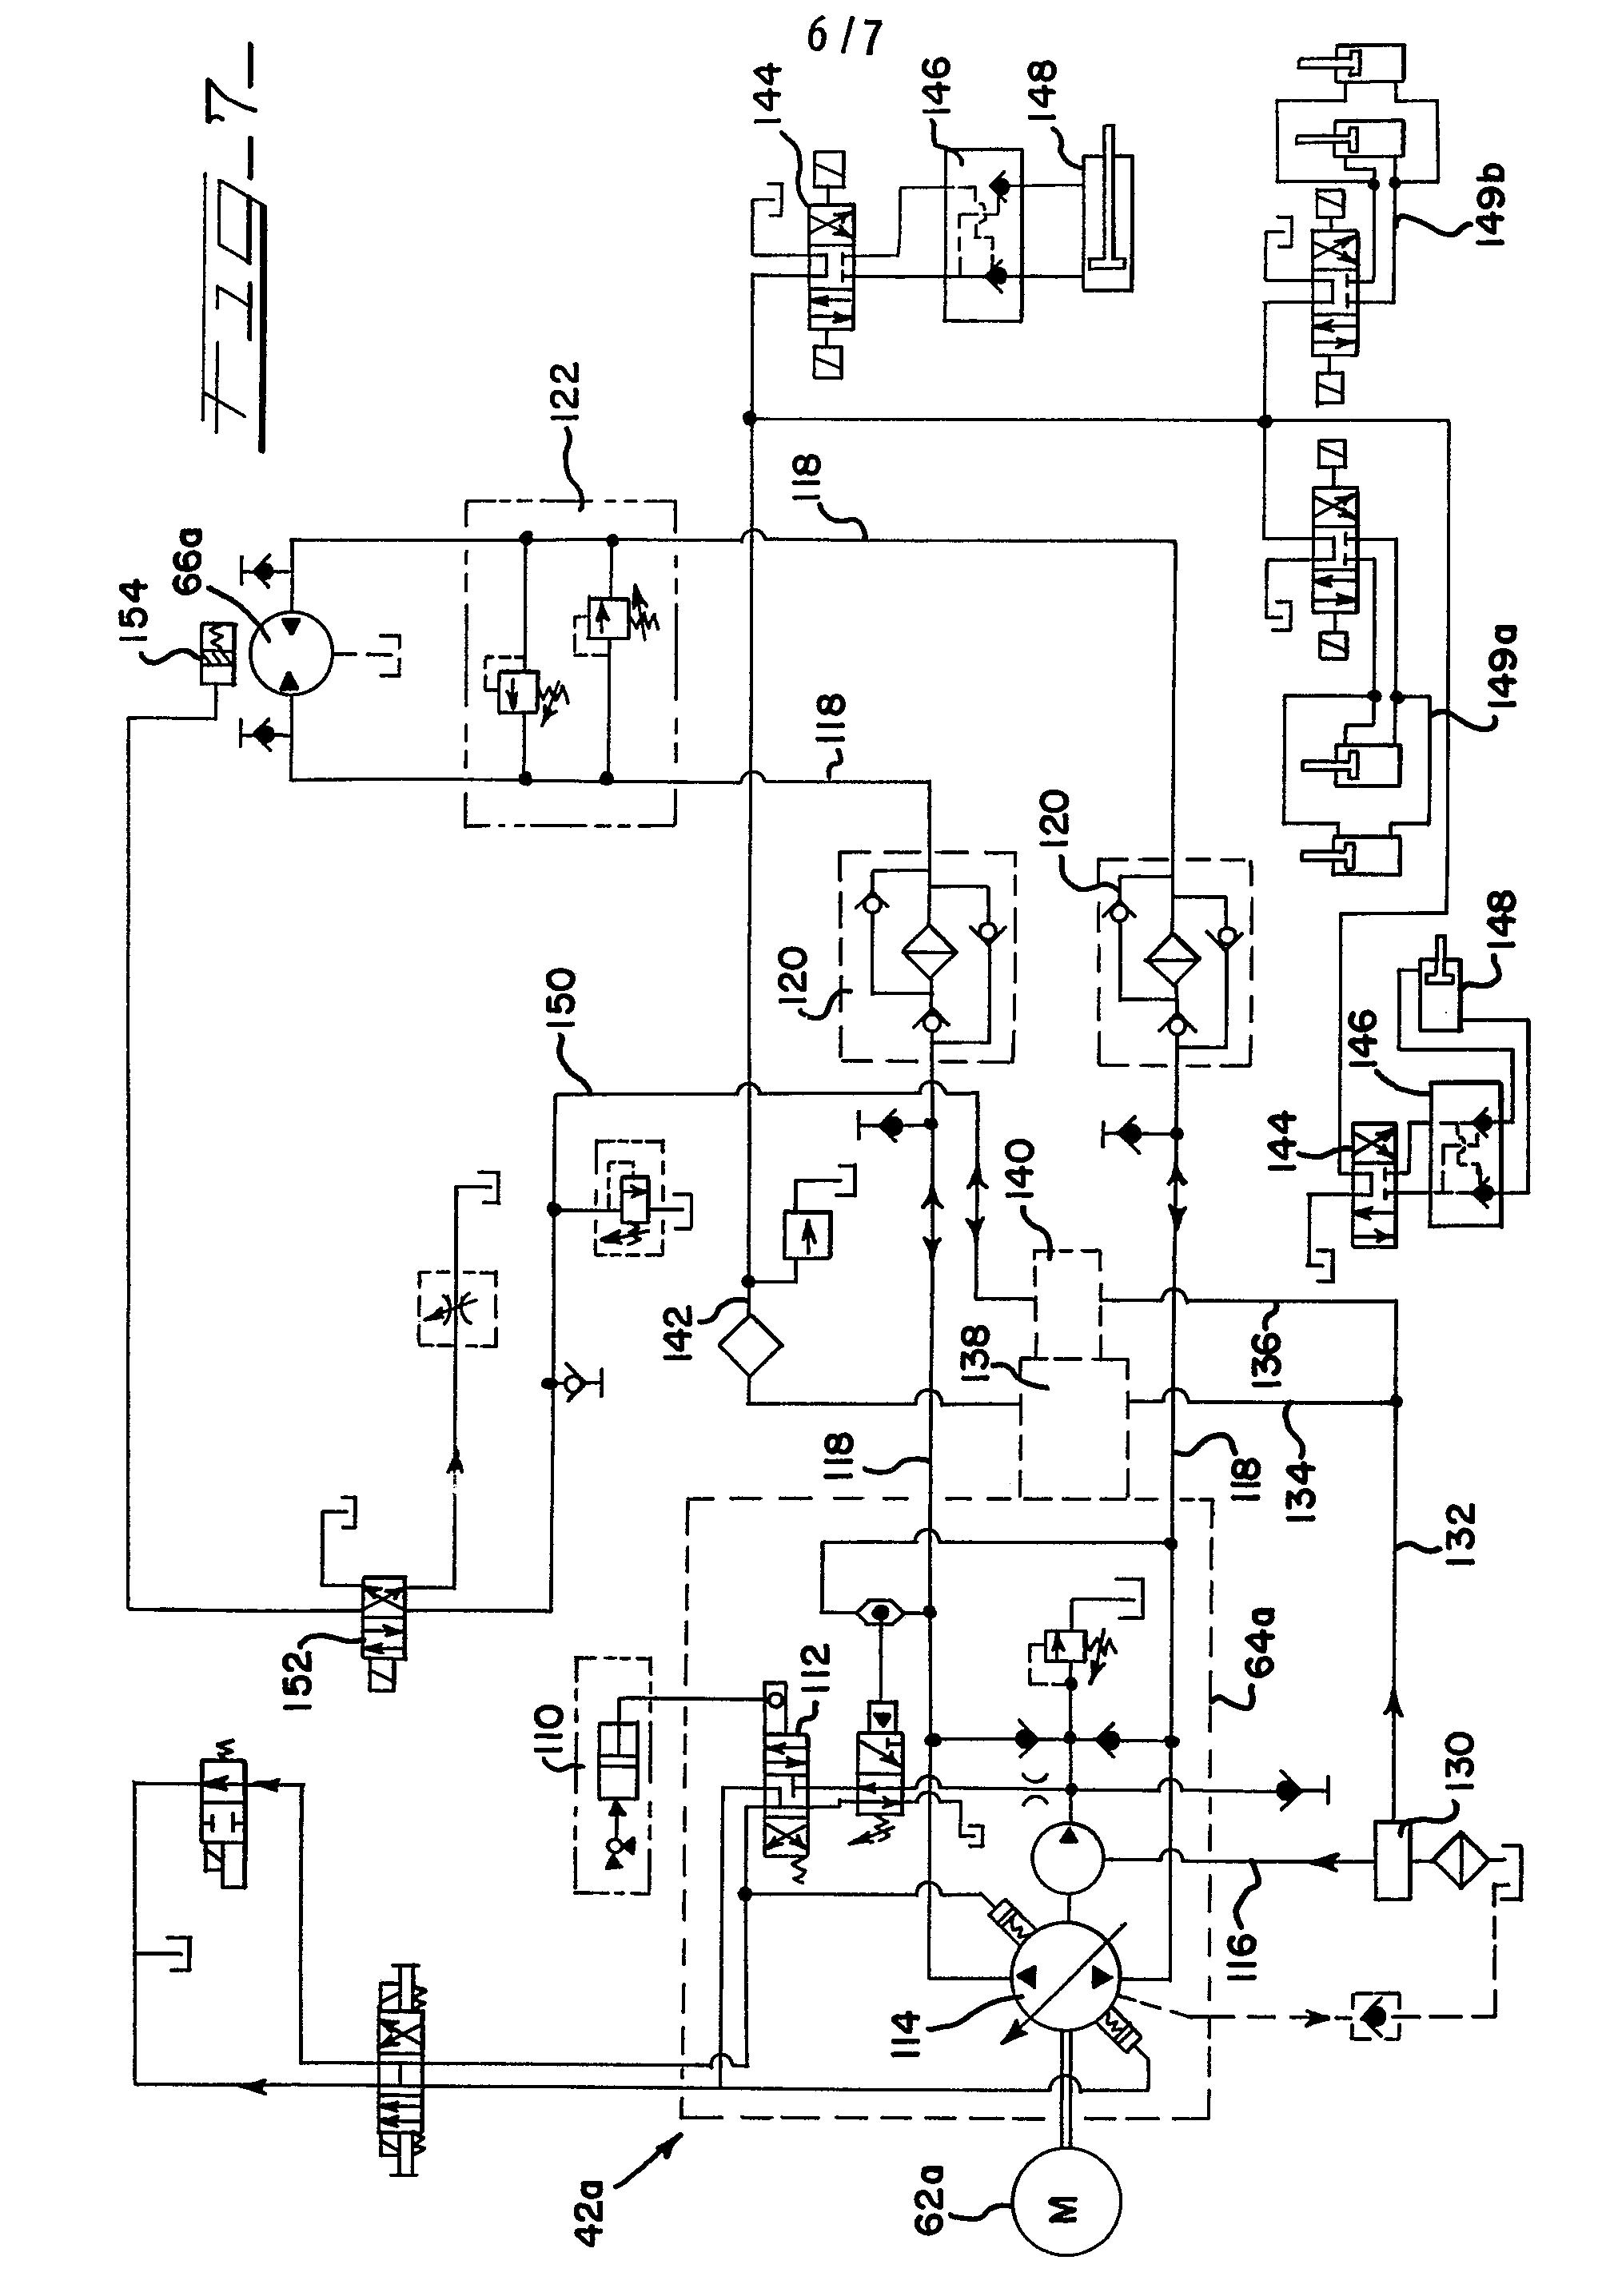 Whirlpool Refrigerator Schematic on viking refrigerator schematic, kitchenaid refrigerator schematic, whirlpool washer schematic, whirlpool wiring schematic, frigidaire stove schematic, whirlpool schematic diagrams, whirlpool dishwasher schematic, ge dishwasher schematic, amana refrigerator schematic, kenmore refrigerator schematic, whirlpool refrigerators ice dispenser problems, refrigerator parts schematic, ge refrigerator schematic, samsung refrigerator schematic, frigidaire refrigerator schematic, hotpoint refrigerator schematic, dometic refrigerator schematic, magic chef refrigerator schematic, haier refrigerator schematic, maytag refrigerator schematic,